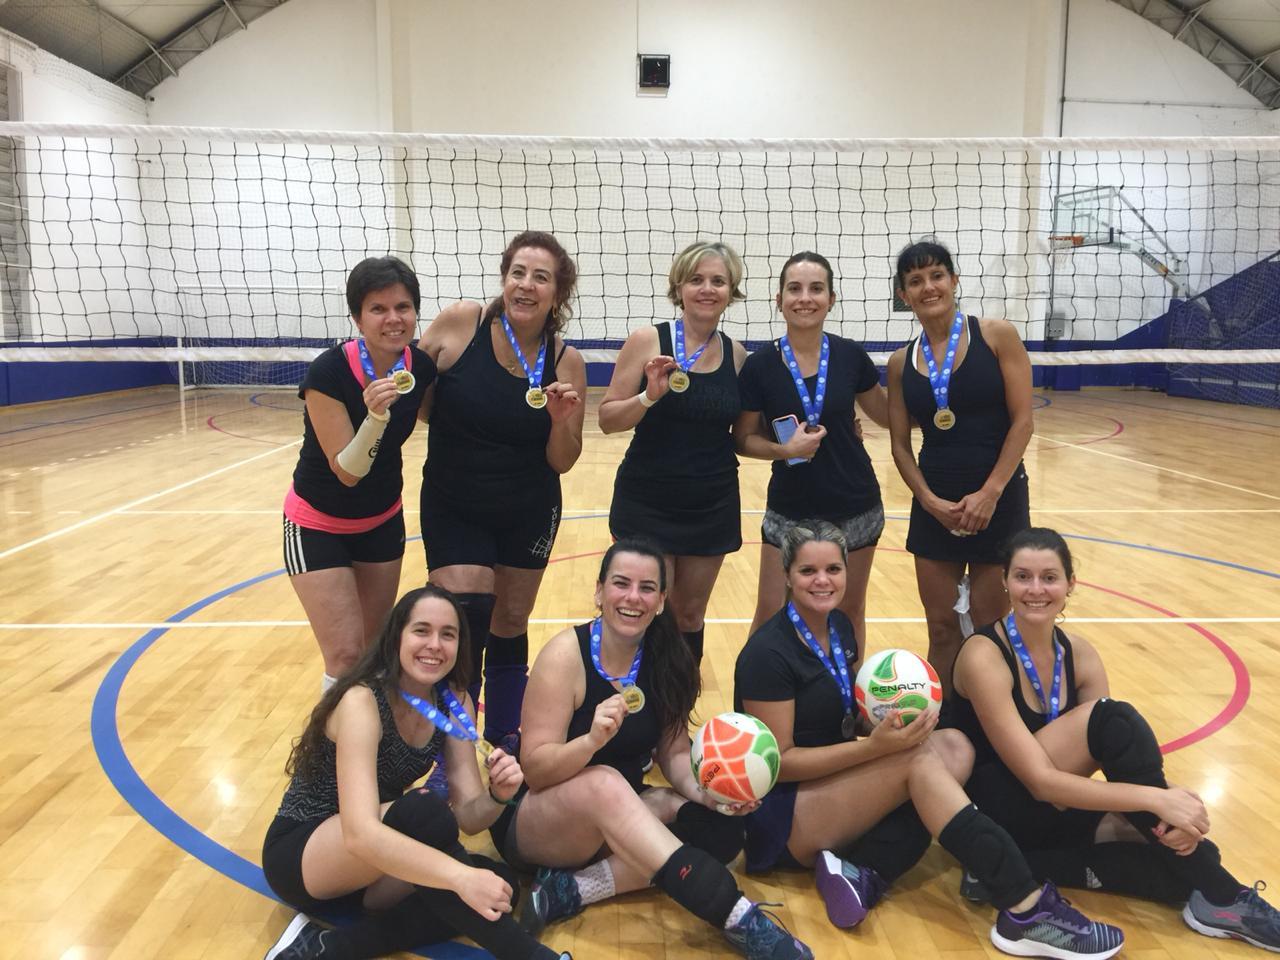 Mônica, Cláudia, Sandra, Jaci, Nagila, Marcela, Anna Fábia, Adriana e Marina Guedes